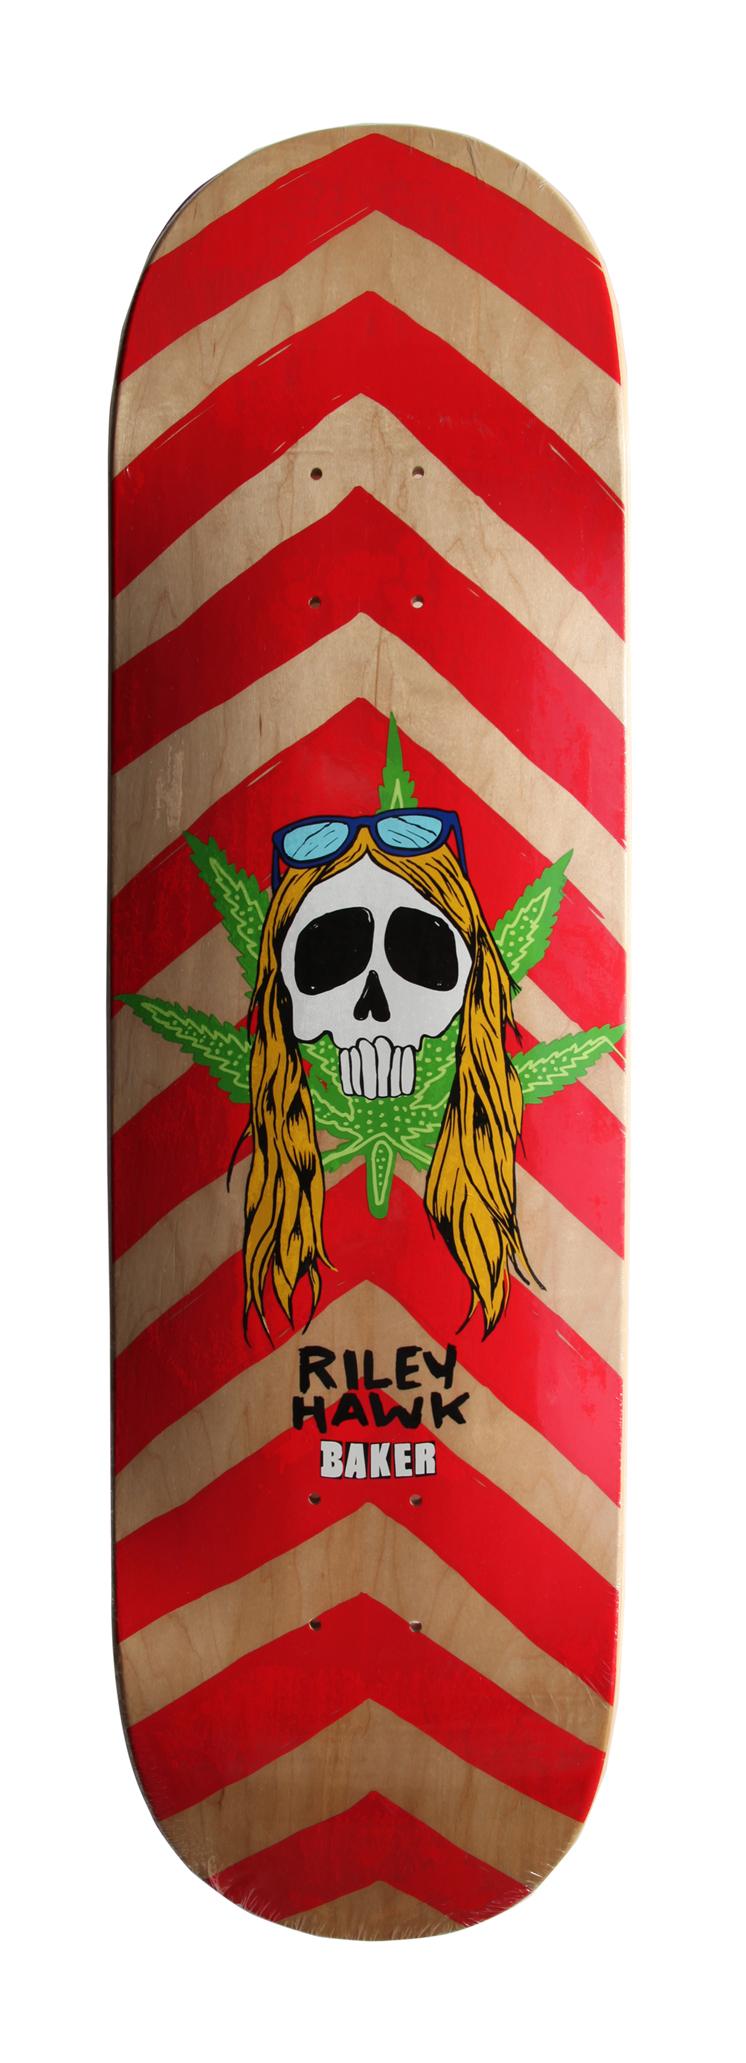 rileybaker.jpg